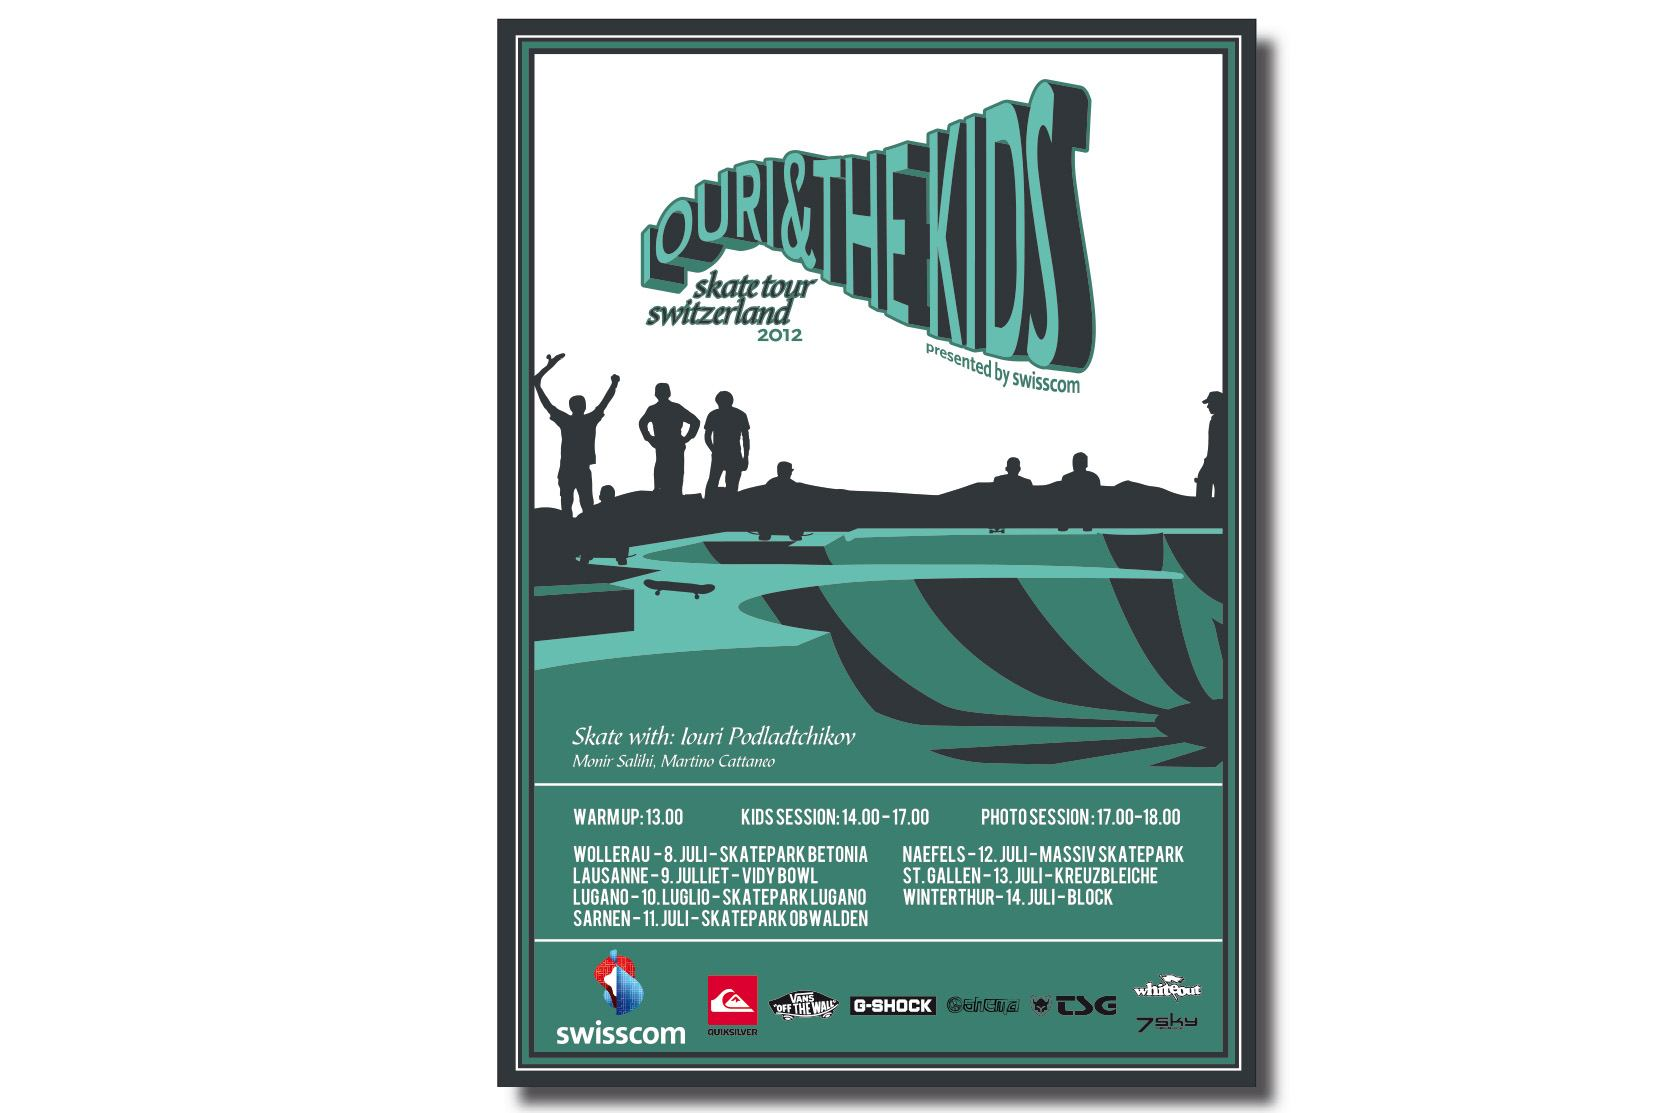 Iouri-Poster